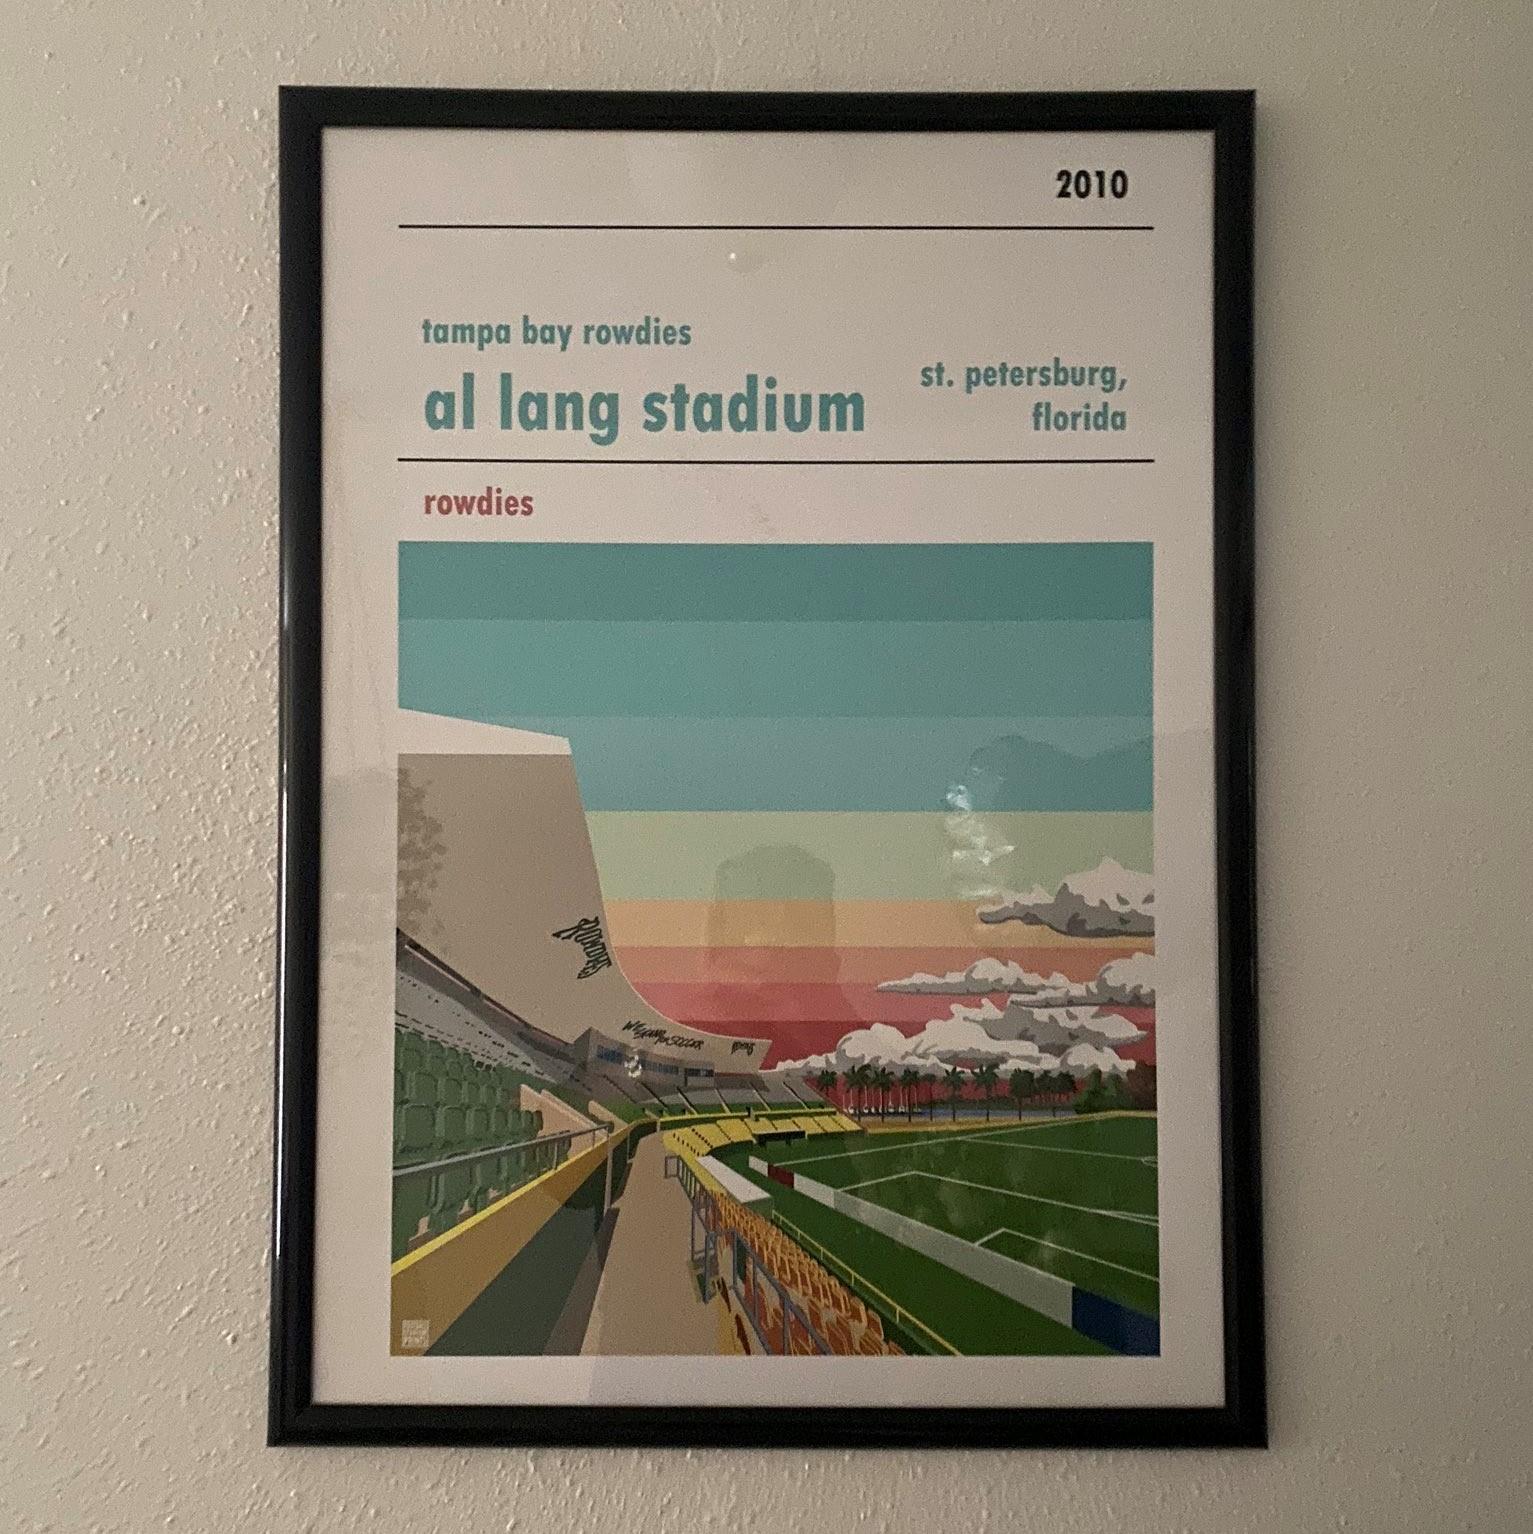 Football Prints of Tampa Bay Rowdies